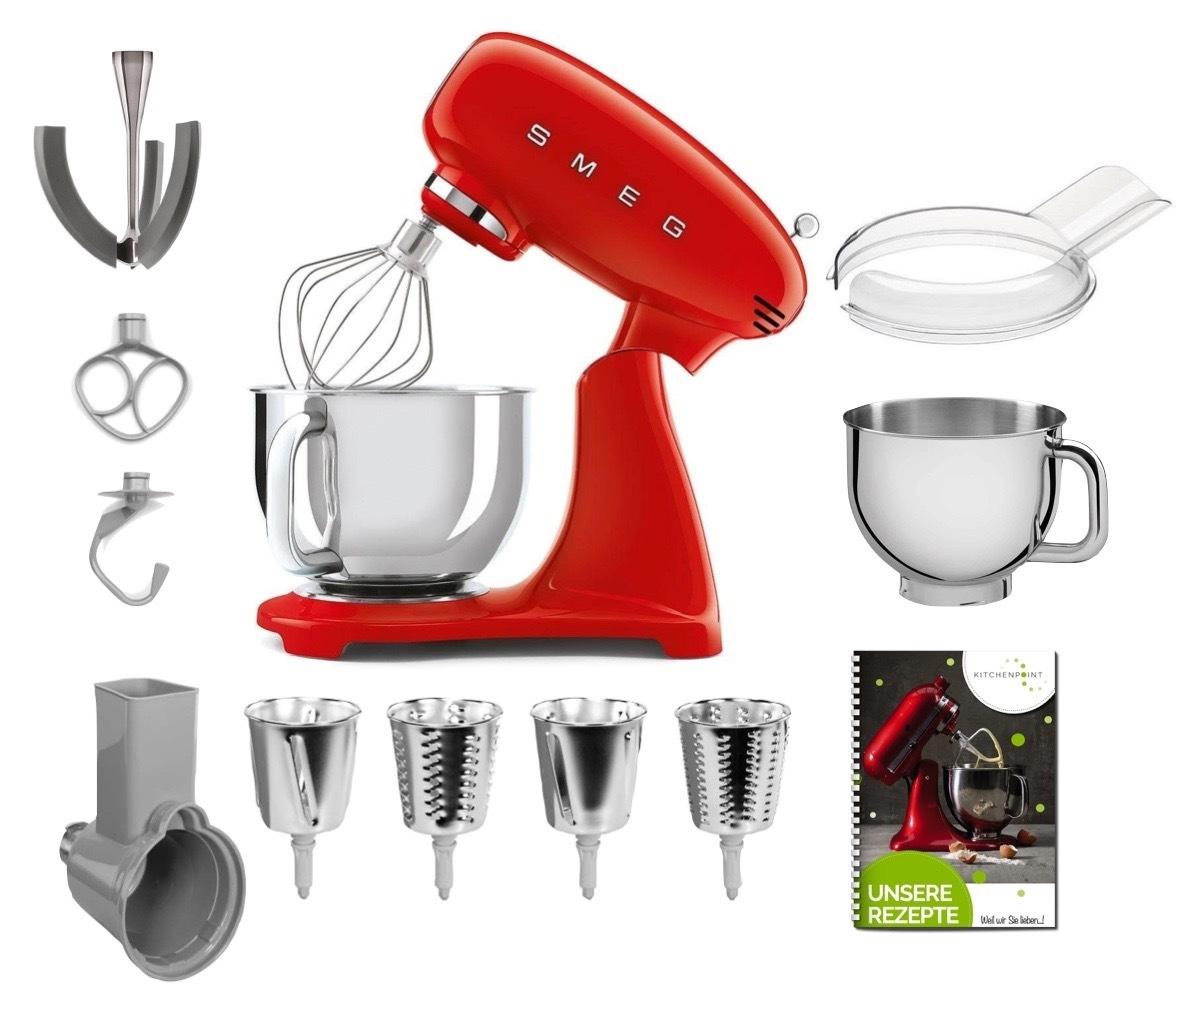 SMEG Küchenmaschine SMF03 Vollfarbe - Gemüse Mega Set Rot